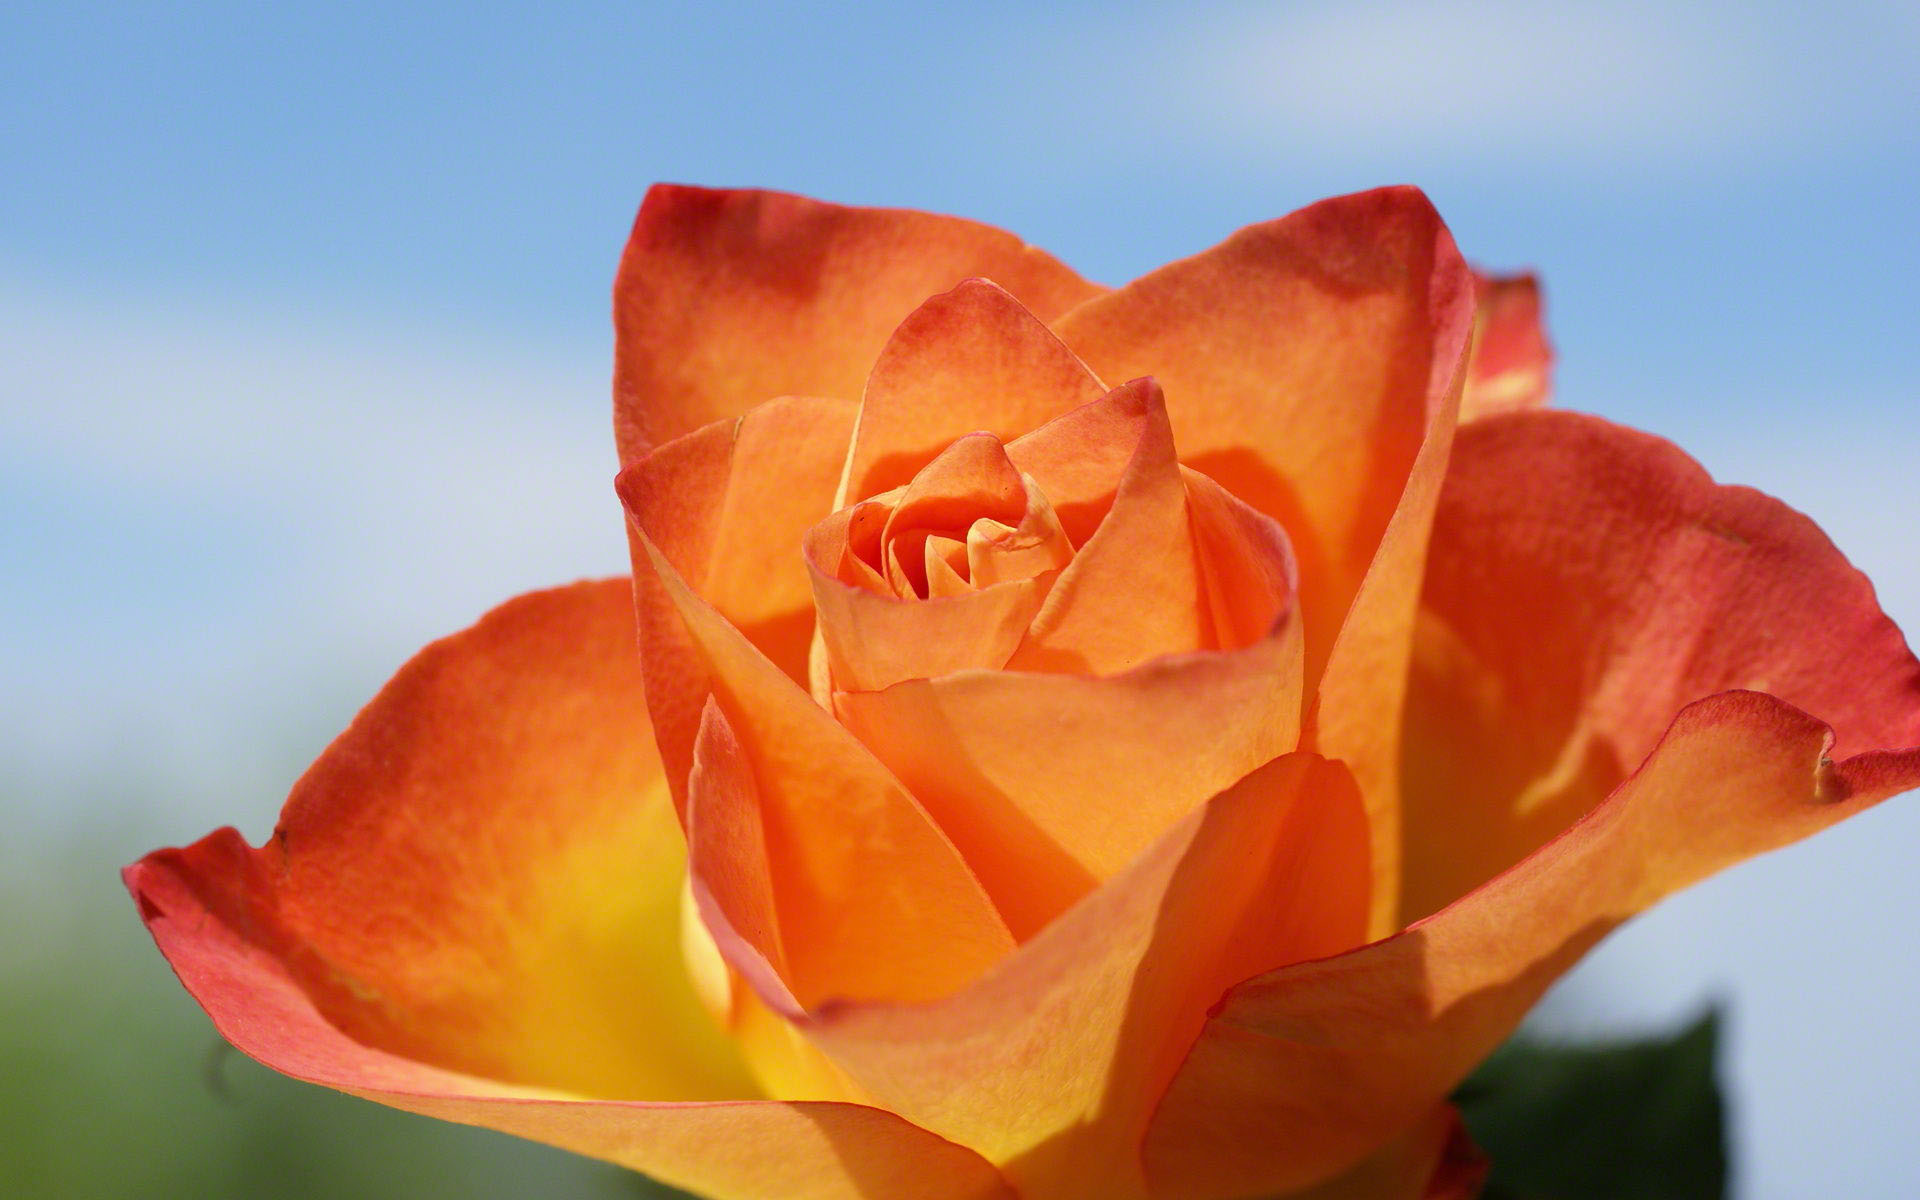 http://www.fabiovisentin.com/photography/photo/12/orange-roses-02739.jpg